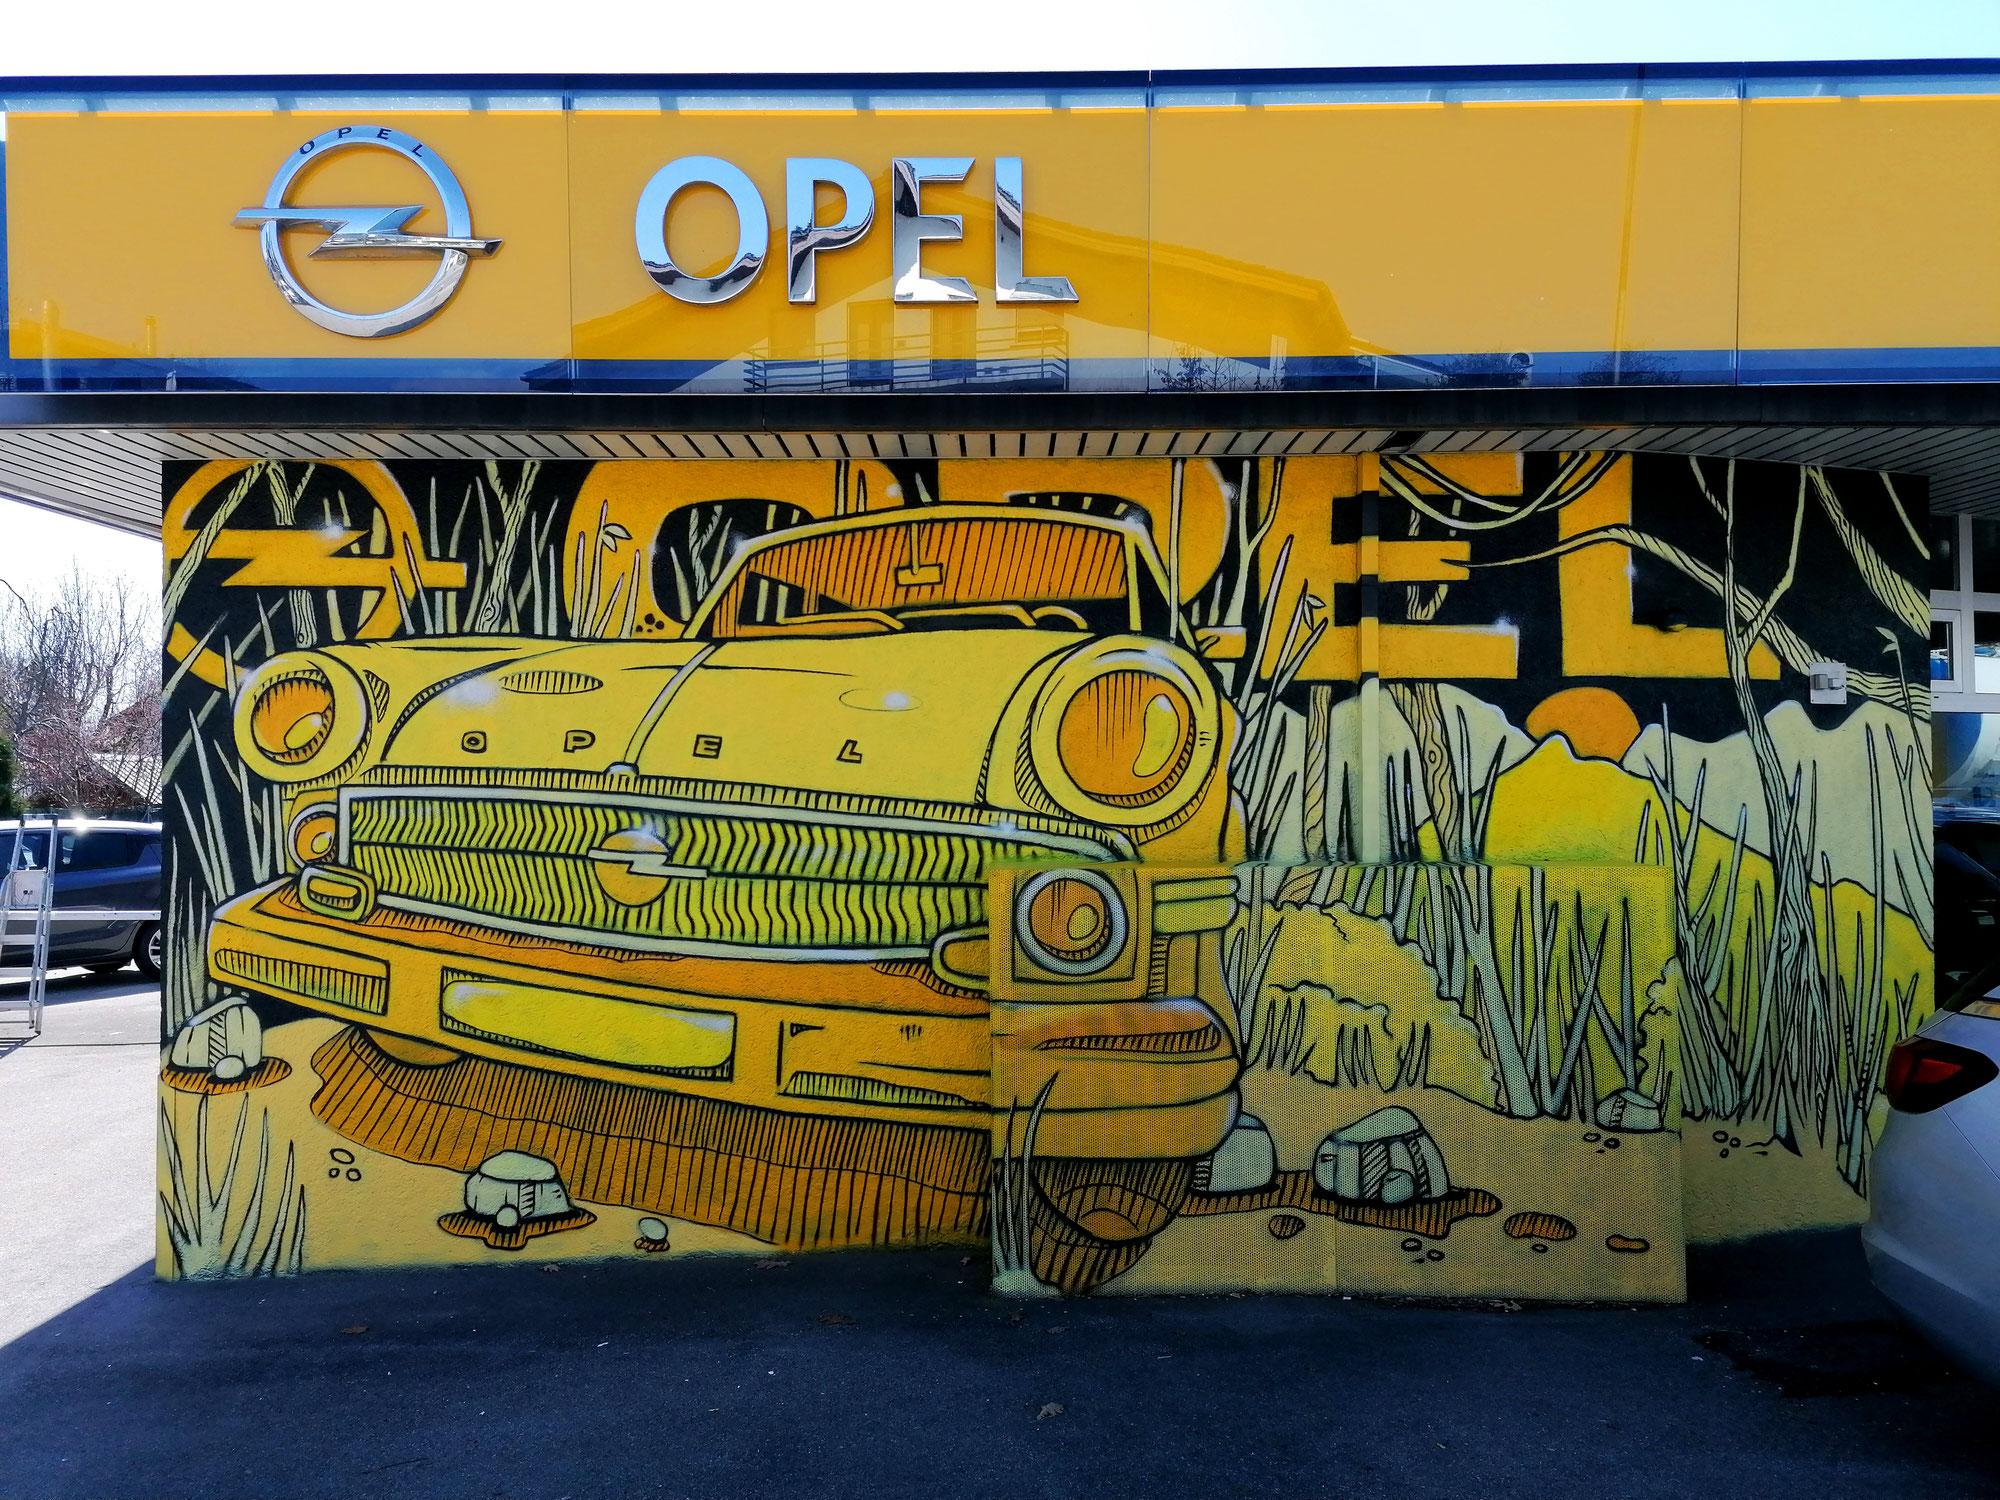 Lieblingsmotiv Auto - Opel, Suzuki